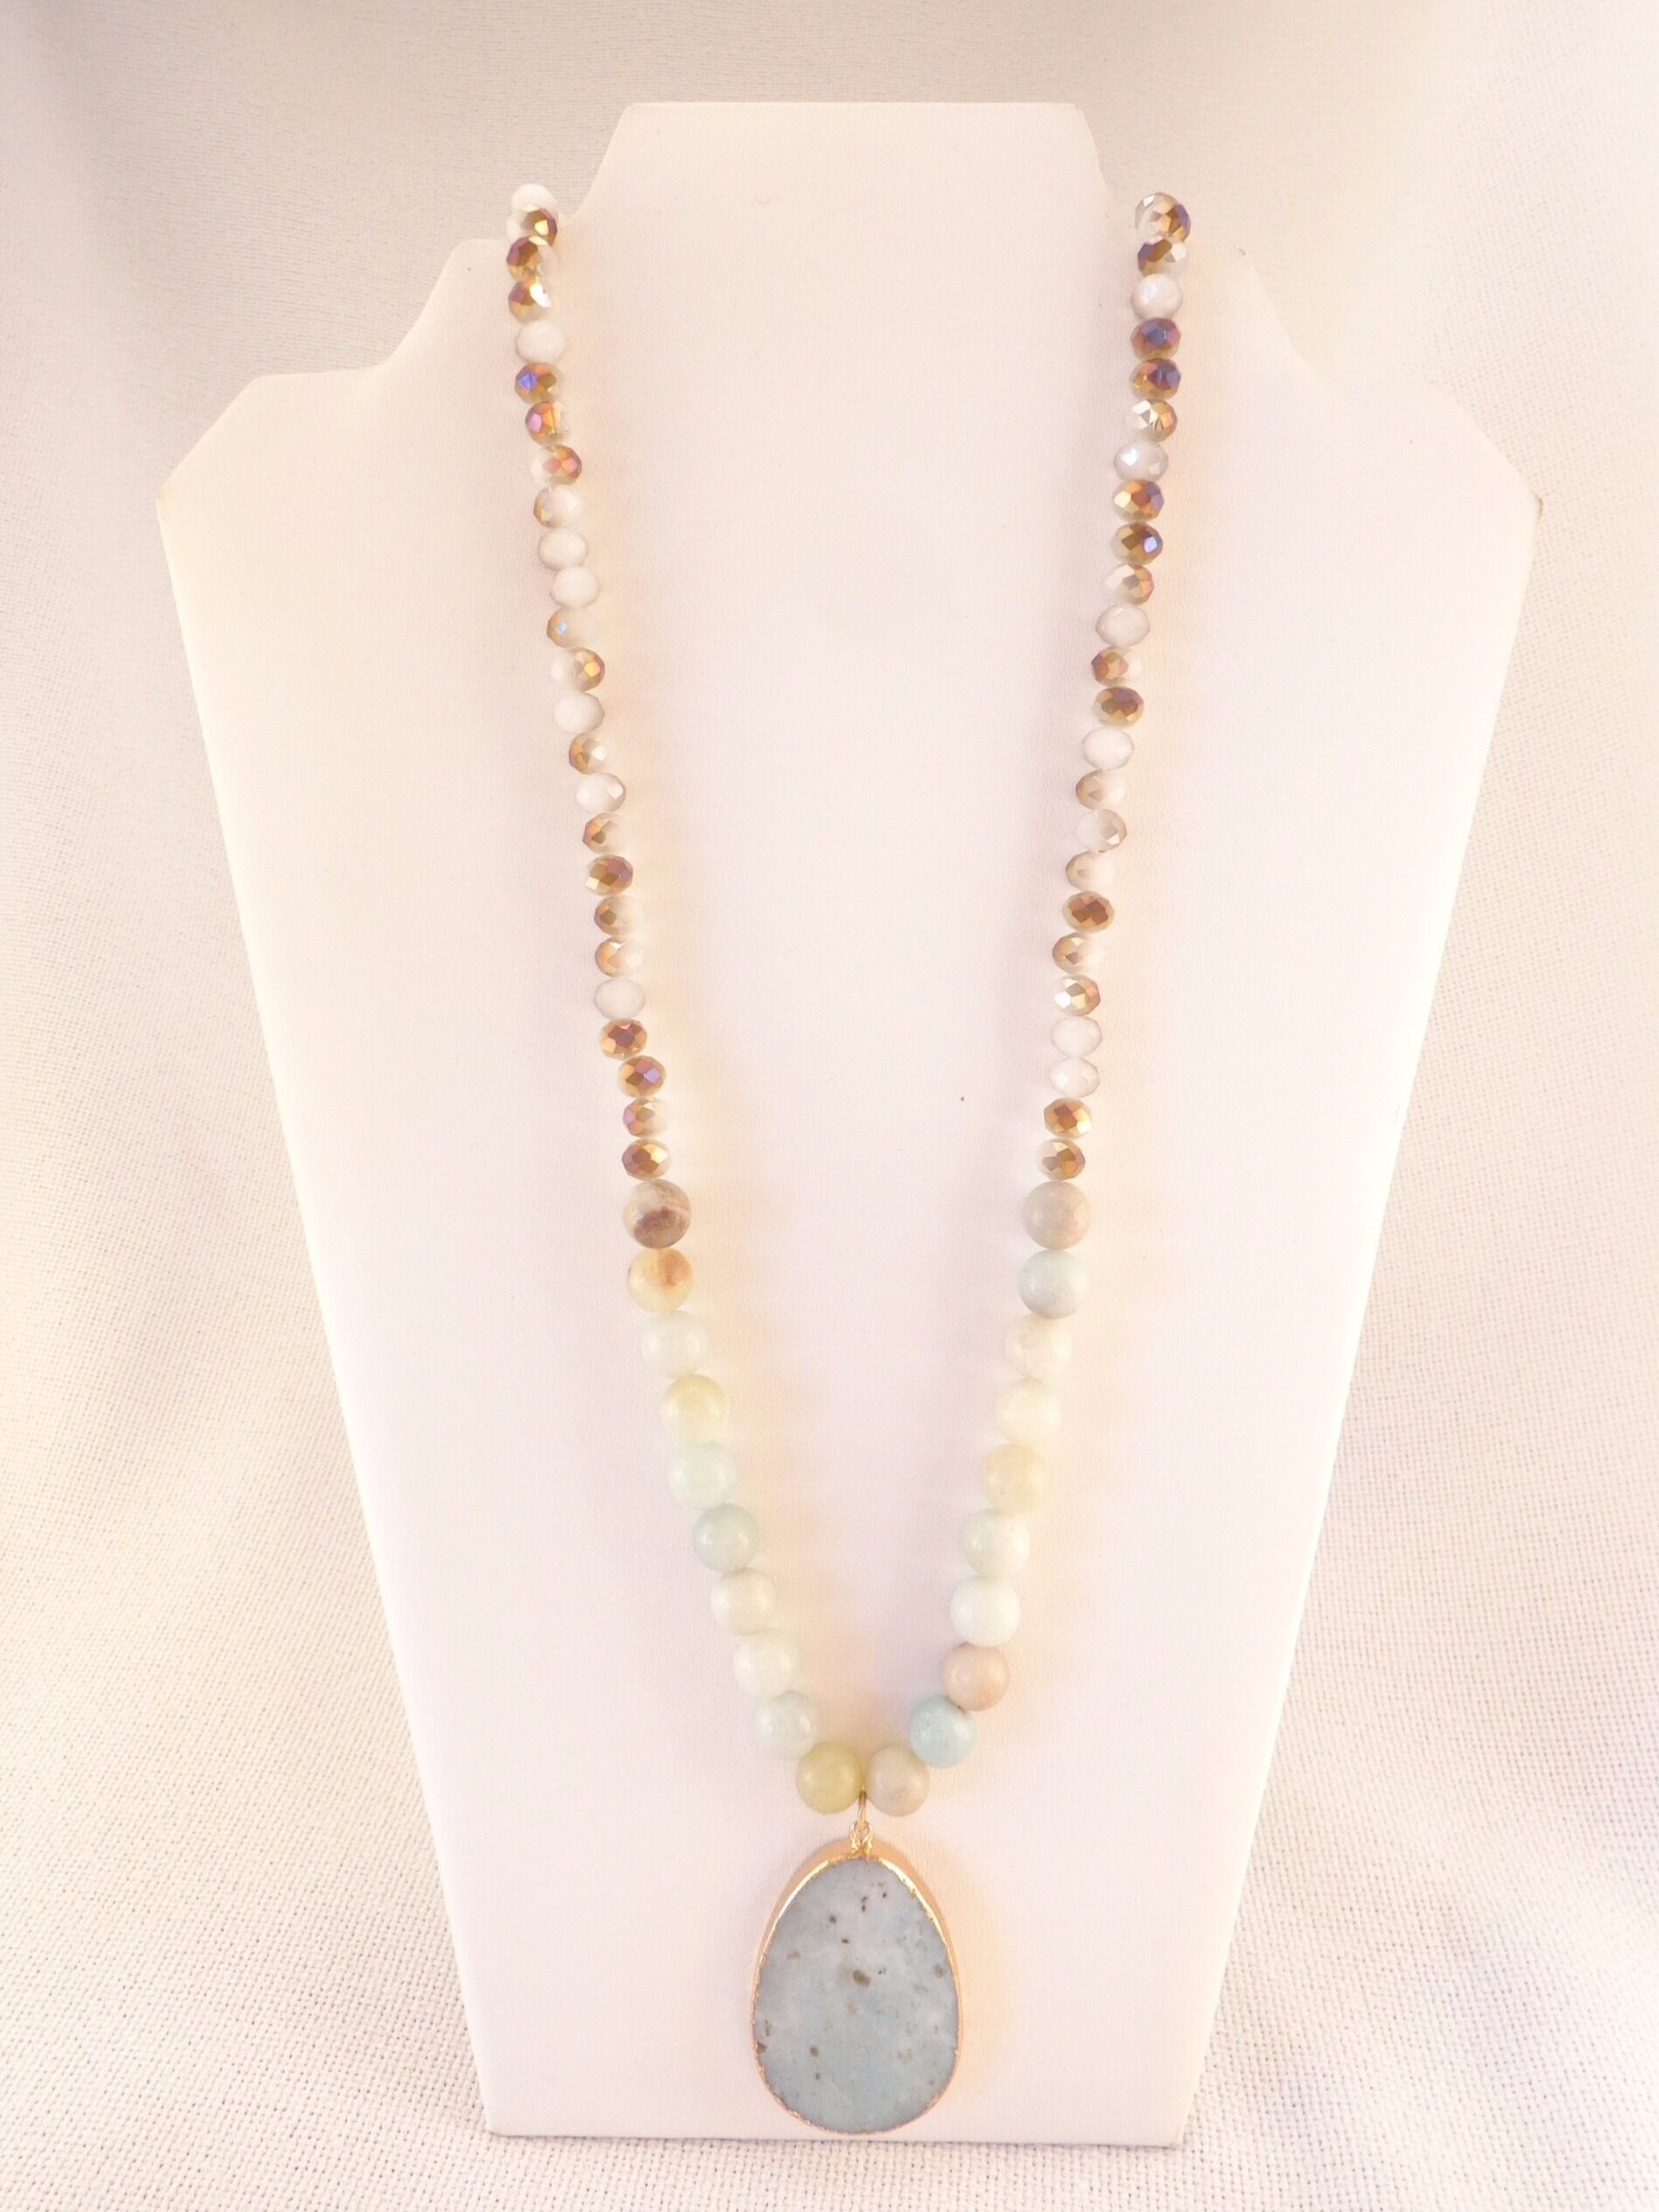 Stone Pendant Beaded Necklace